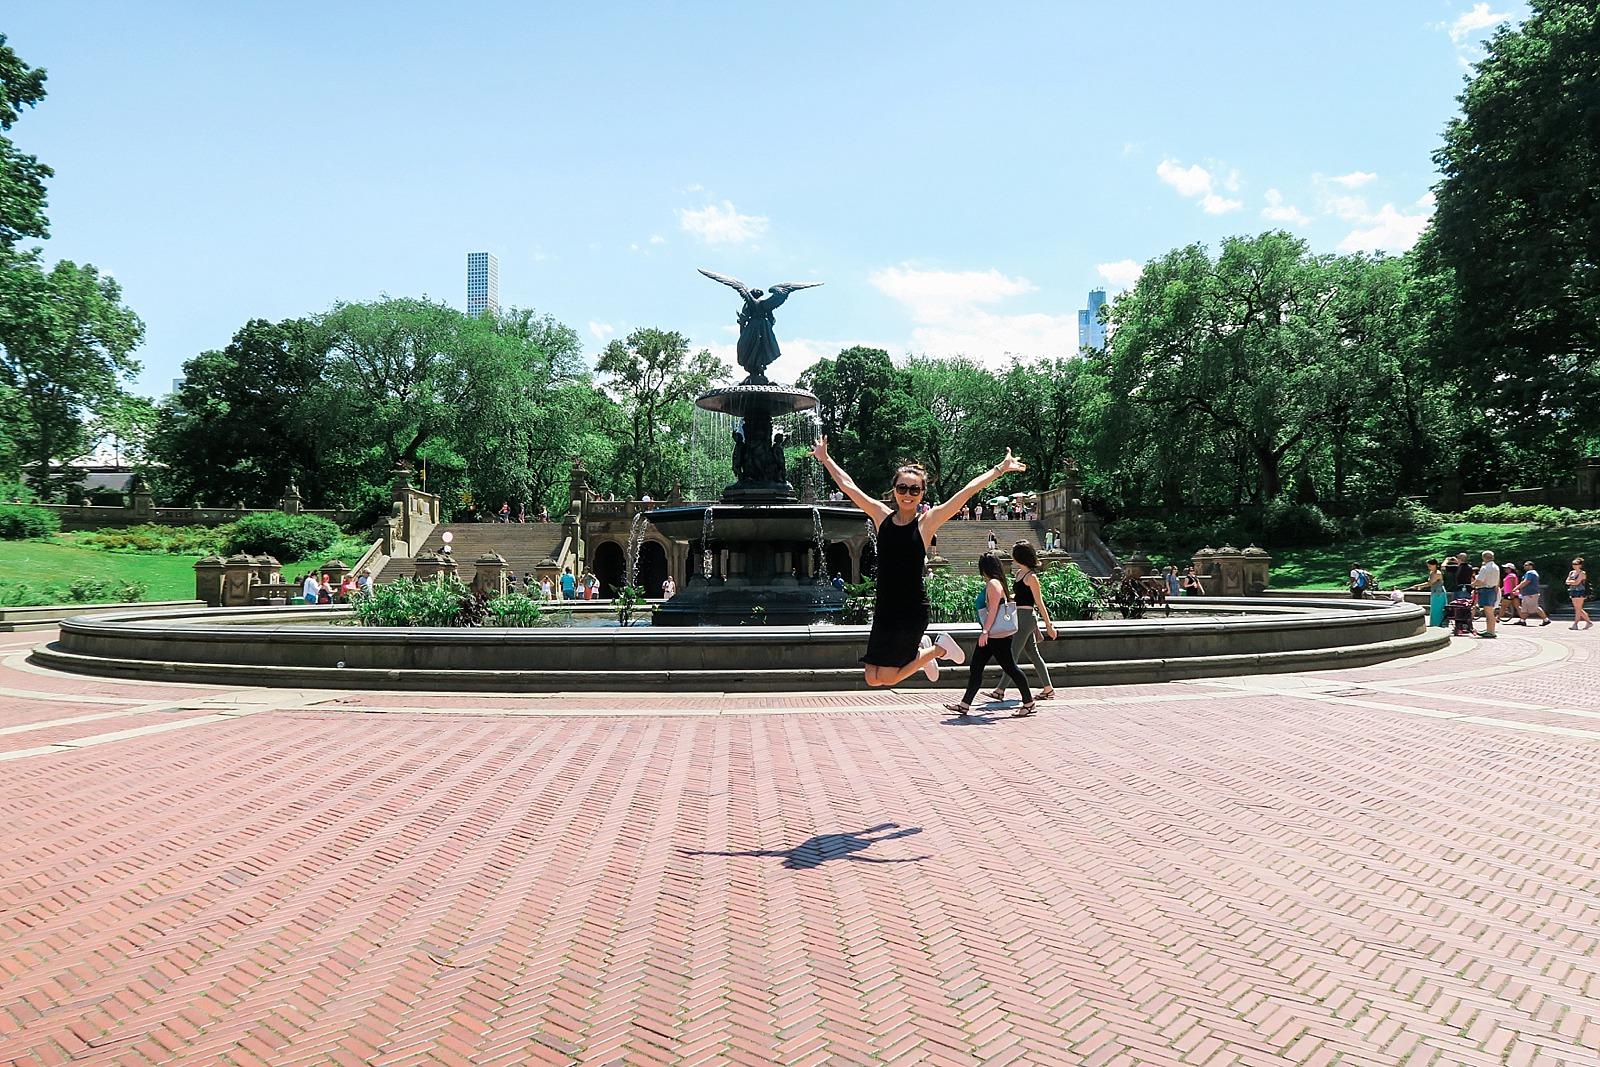 diana-elizabeth-steffen-phoenix-blogger-travel-new-york-brooklyn_0070